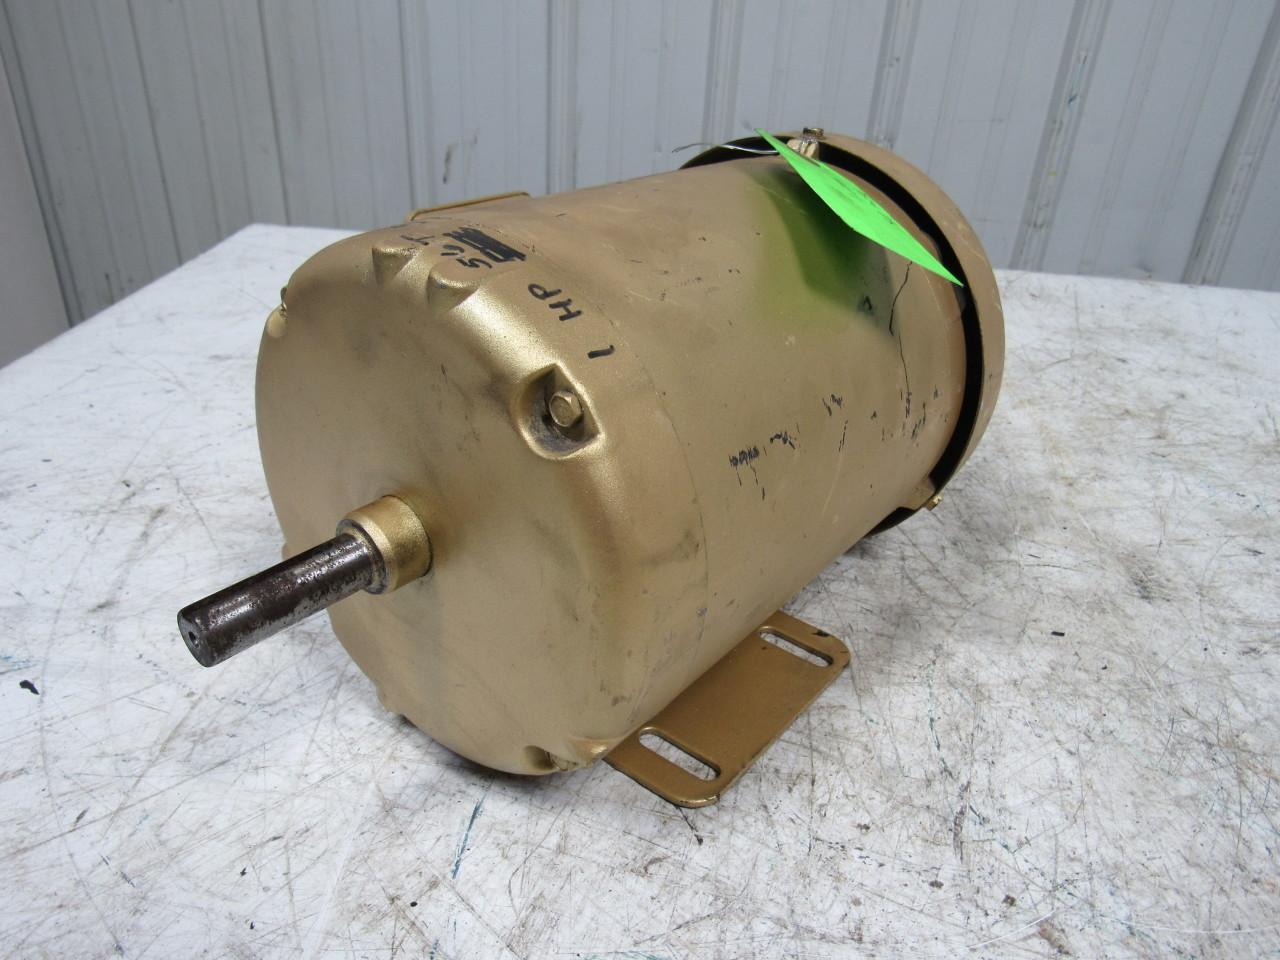 Baldor cem3545 1 hp ac electric motor 3ph 56c 3450rpm tefc for 1 8 hp electric motor